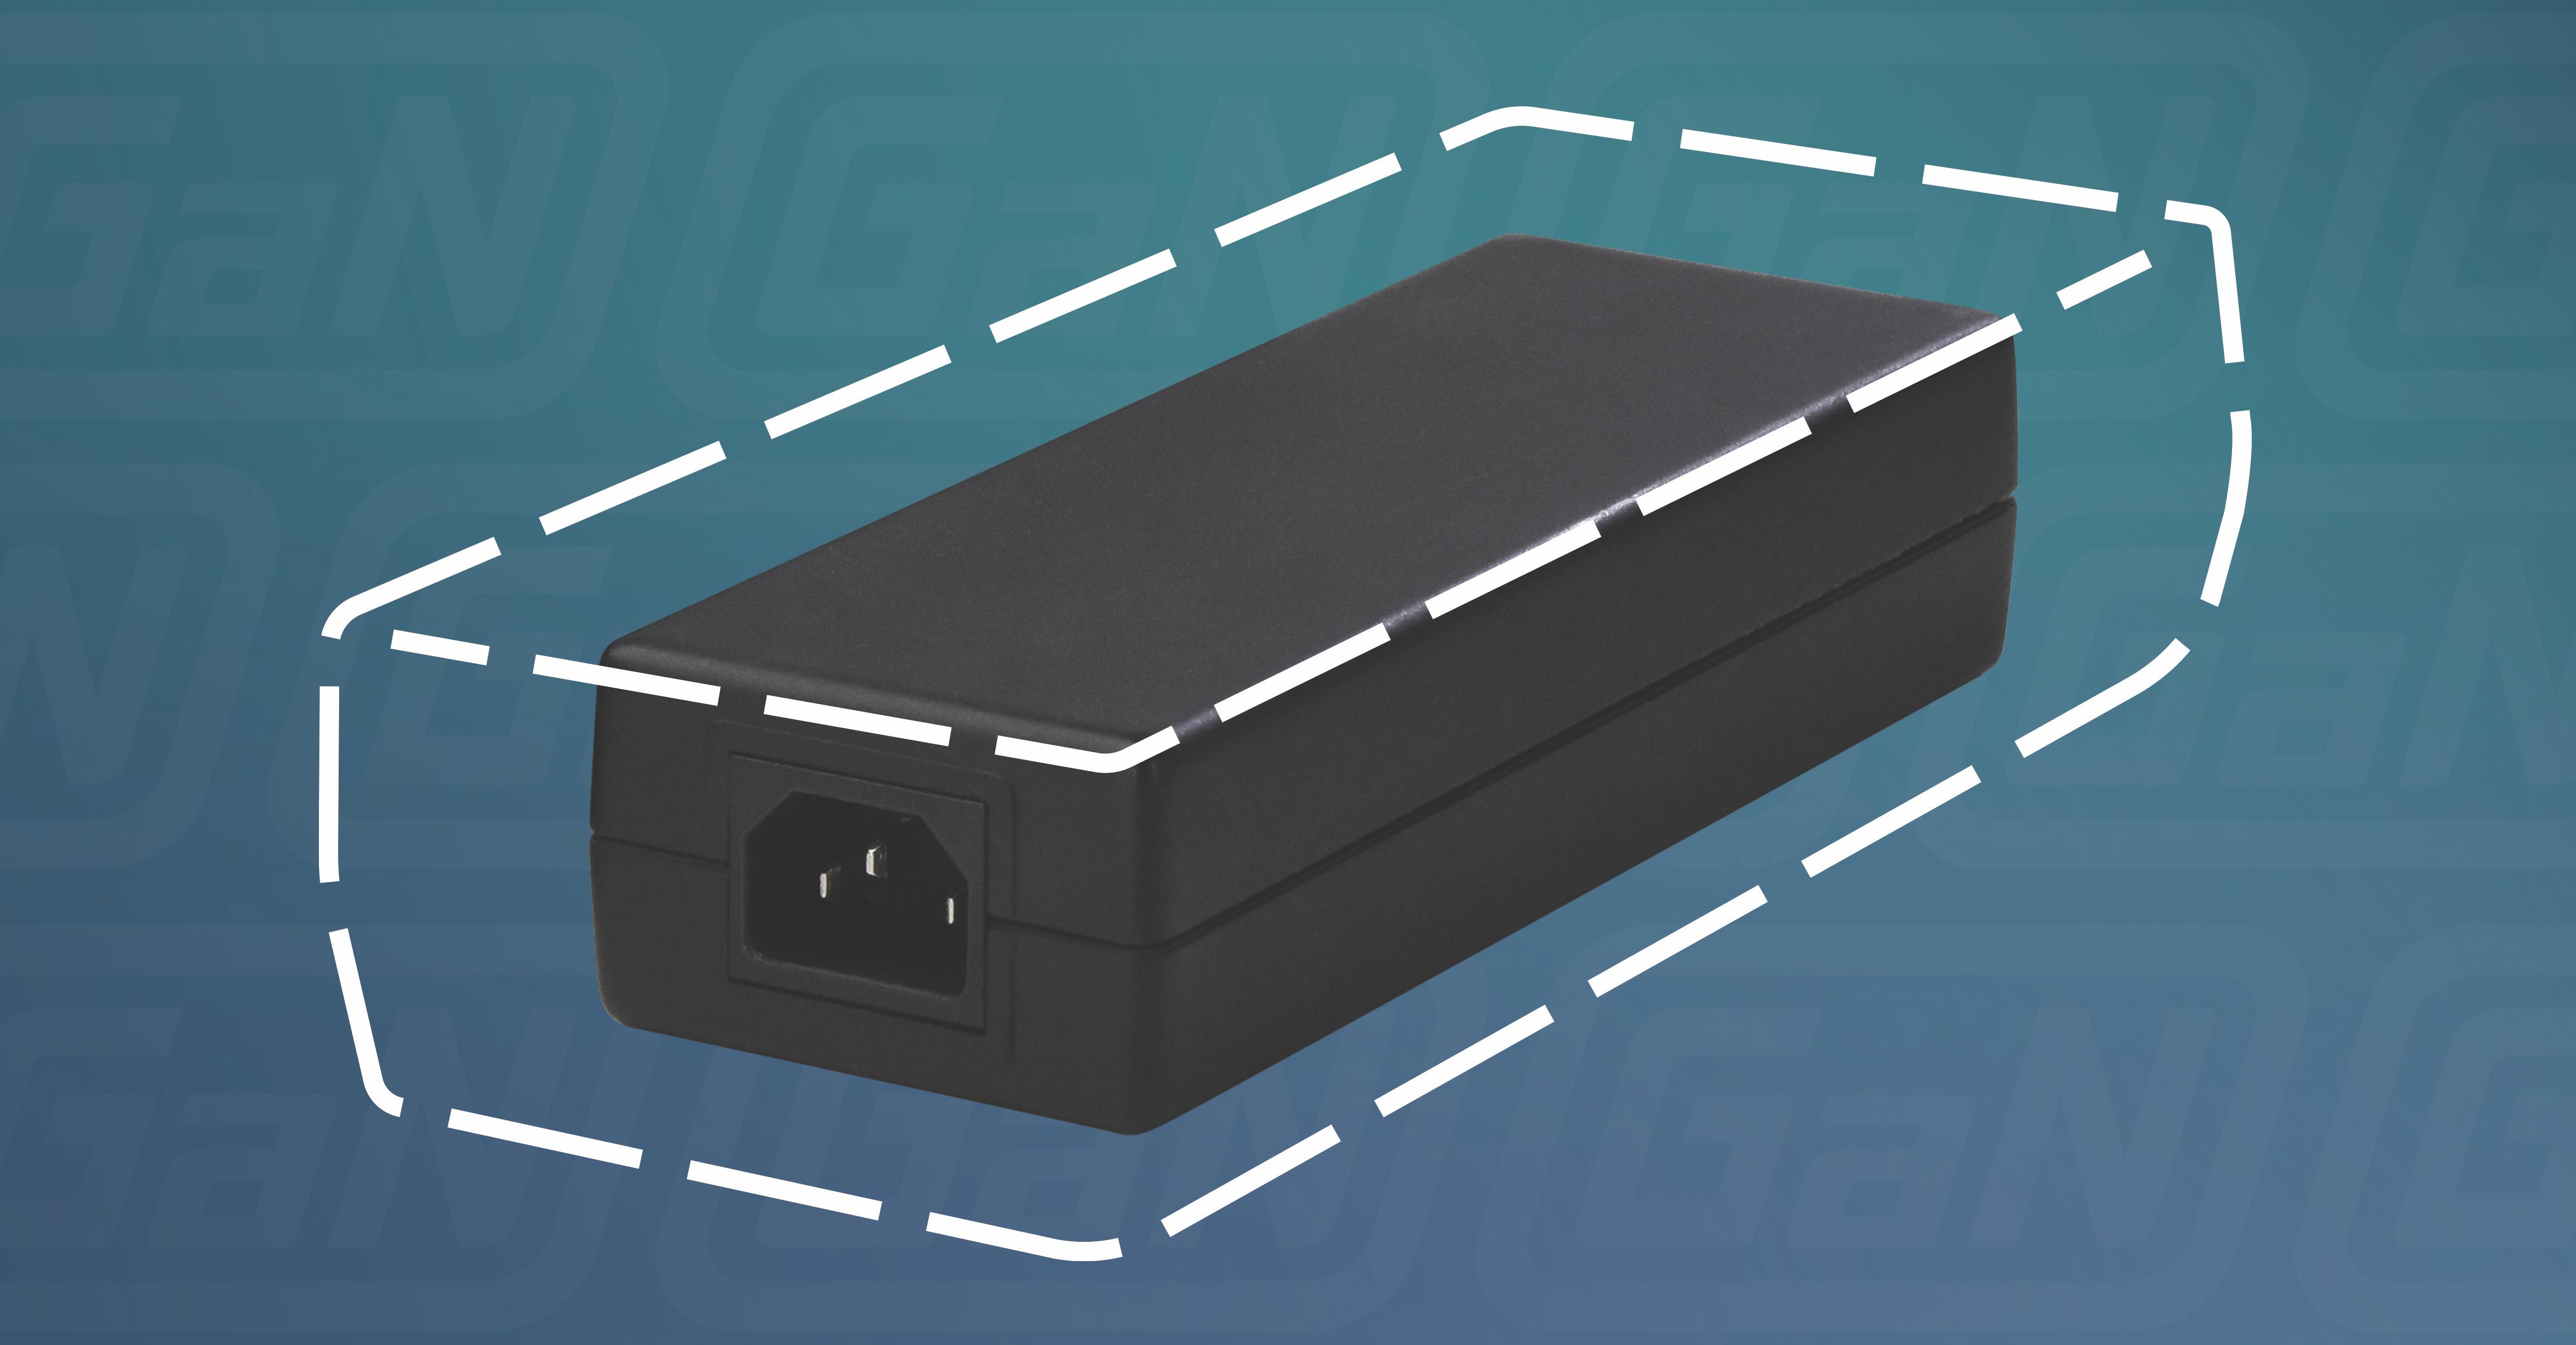 AC-DC Supply Line Includes Compact GaN Desktop Adapter